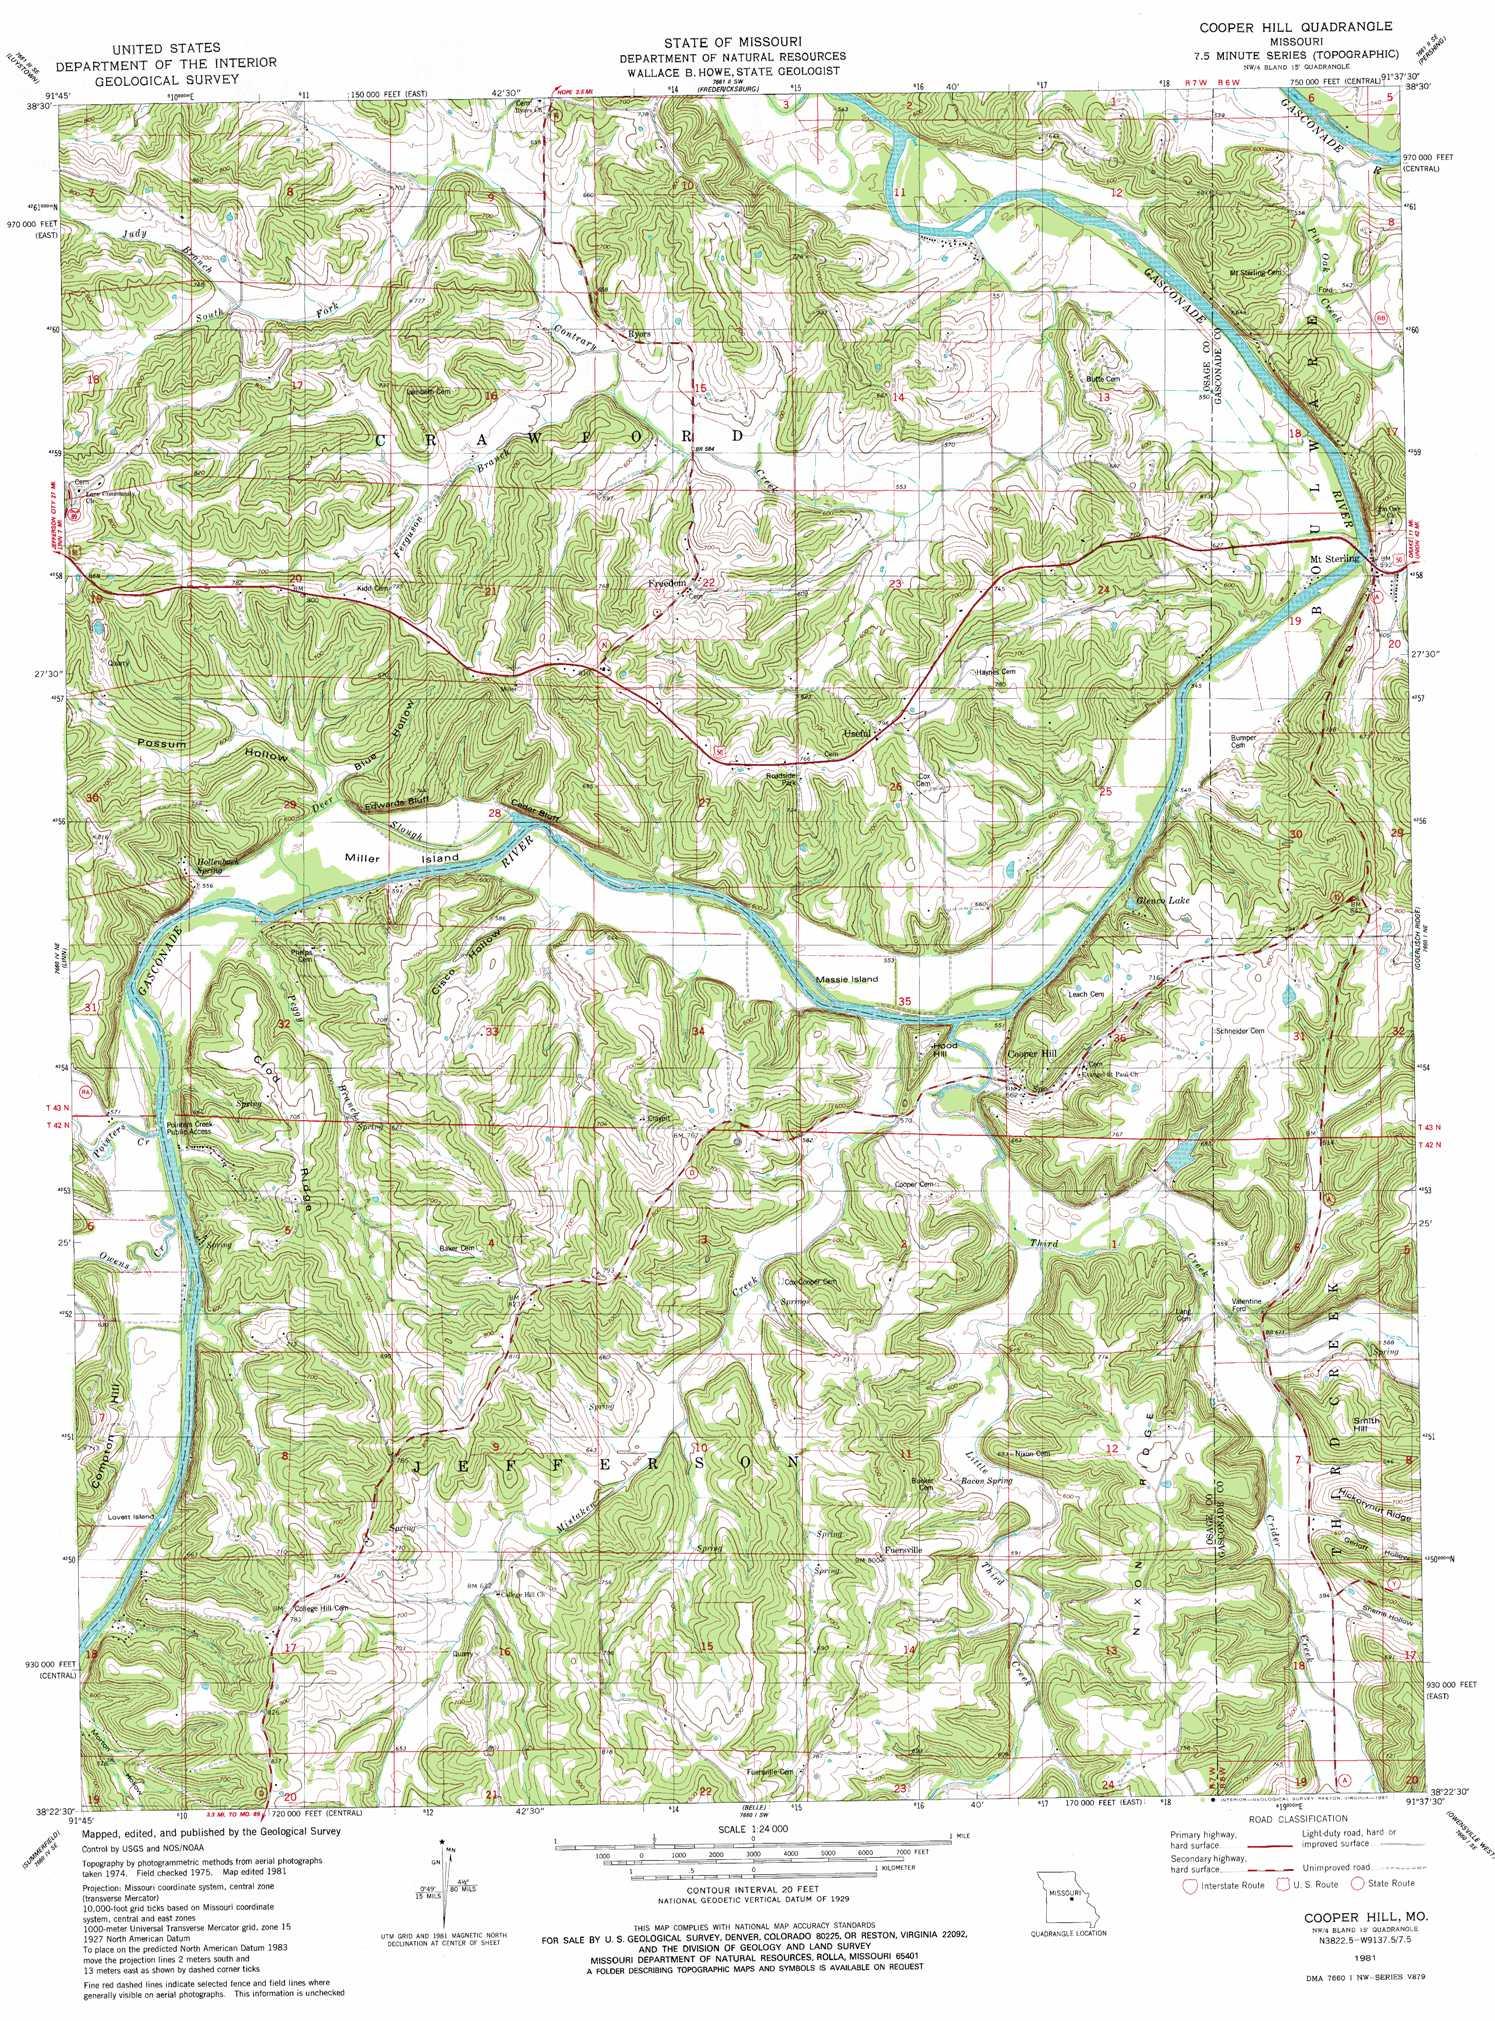 517dd7cda72d Cooper Hill topographic map, MO - USGS Topo Quad 38091d6